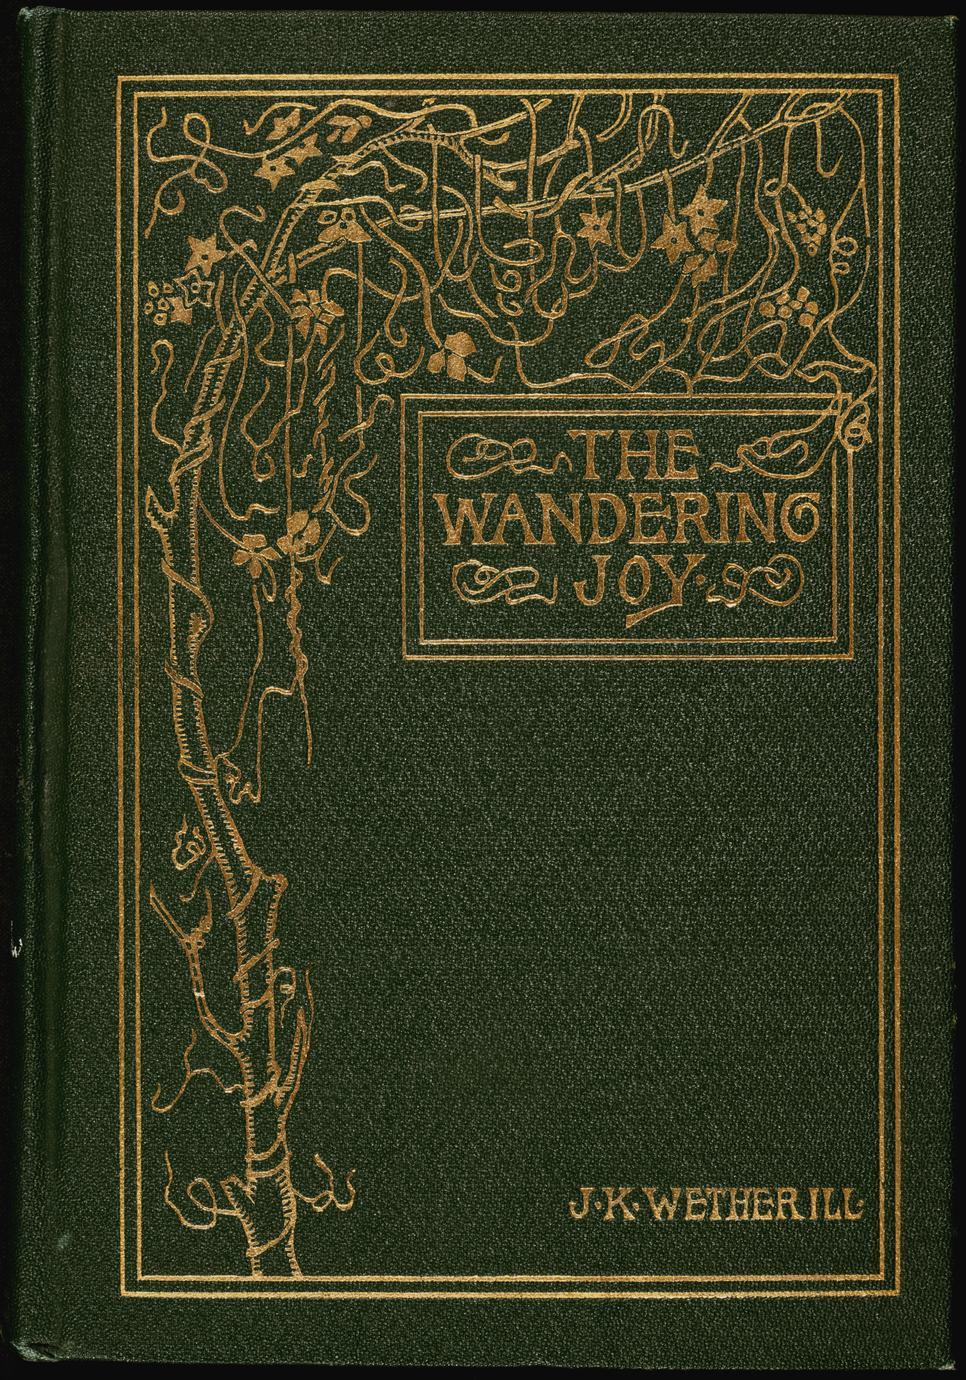 The wandering joy (1 of 2)